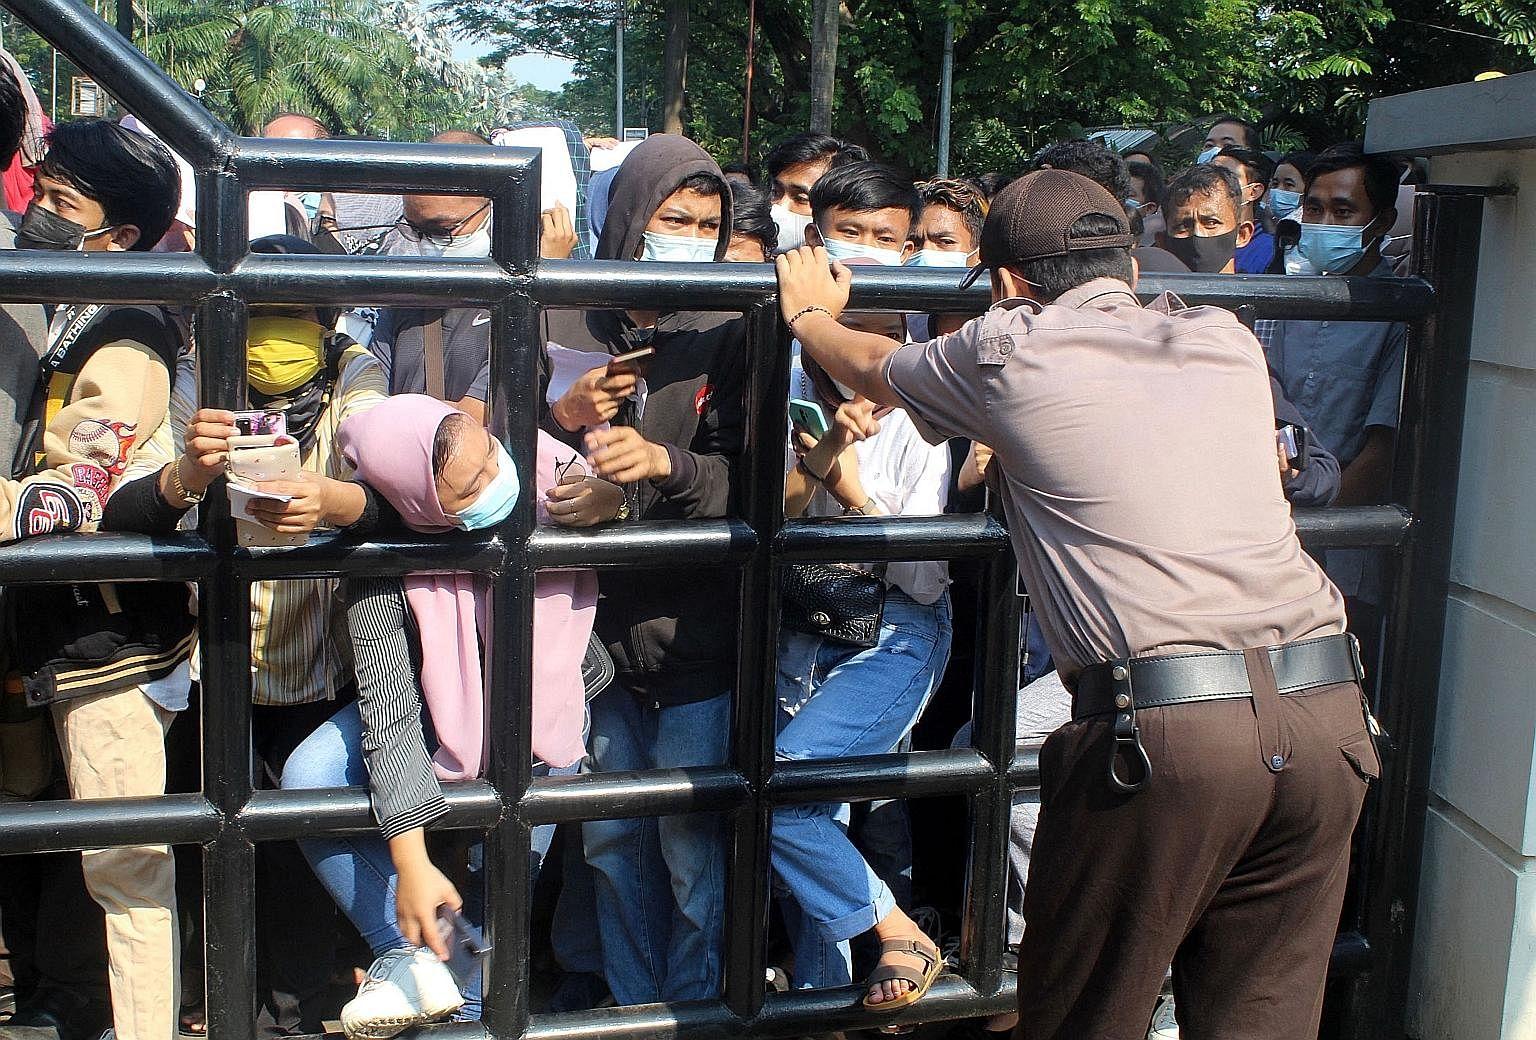 Orang-orang Indonesia berkumpul di luar pusat vaksinasi Pemerintah-19 di Tangerang, pinggiran Jakarta, untuk memerangi epidemi kedua yang didorong oleh keragaman delta yang lebih menular di negara itu.  Indonesia diperkirakan akan memberlakukan aturan yang keras